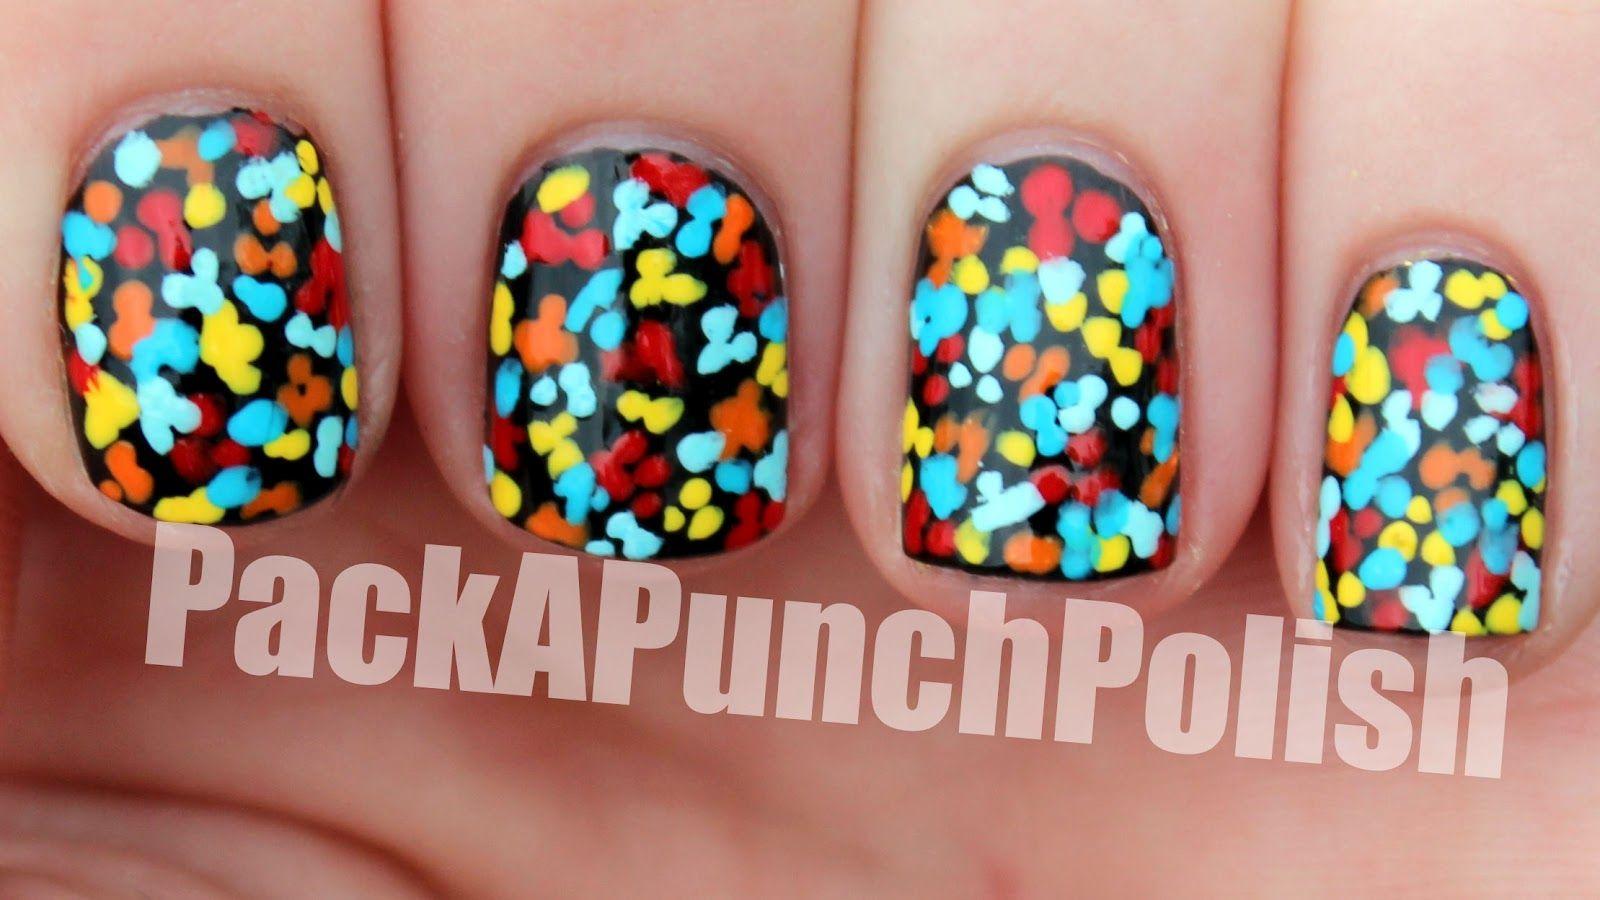 Packapunchpolish Tiny Dotted Floral Nail Art Nails Pinterest